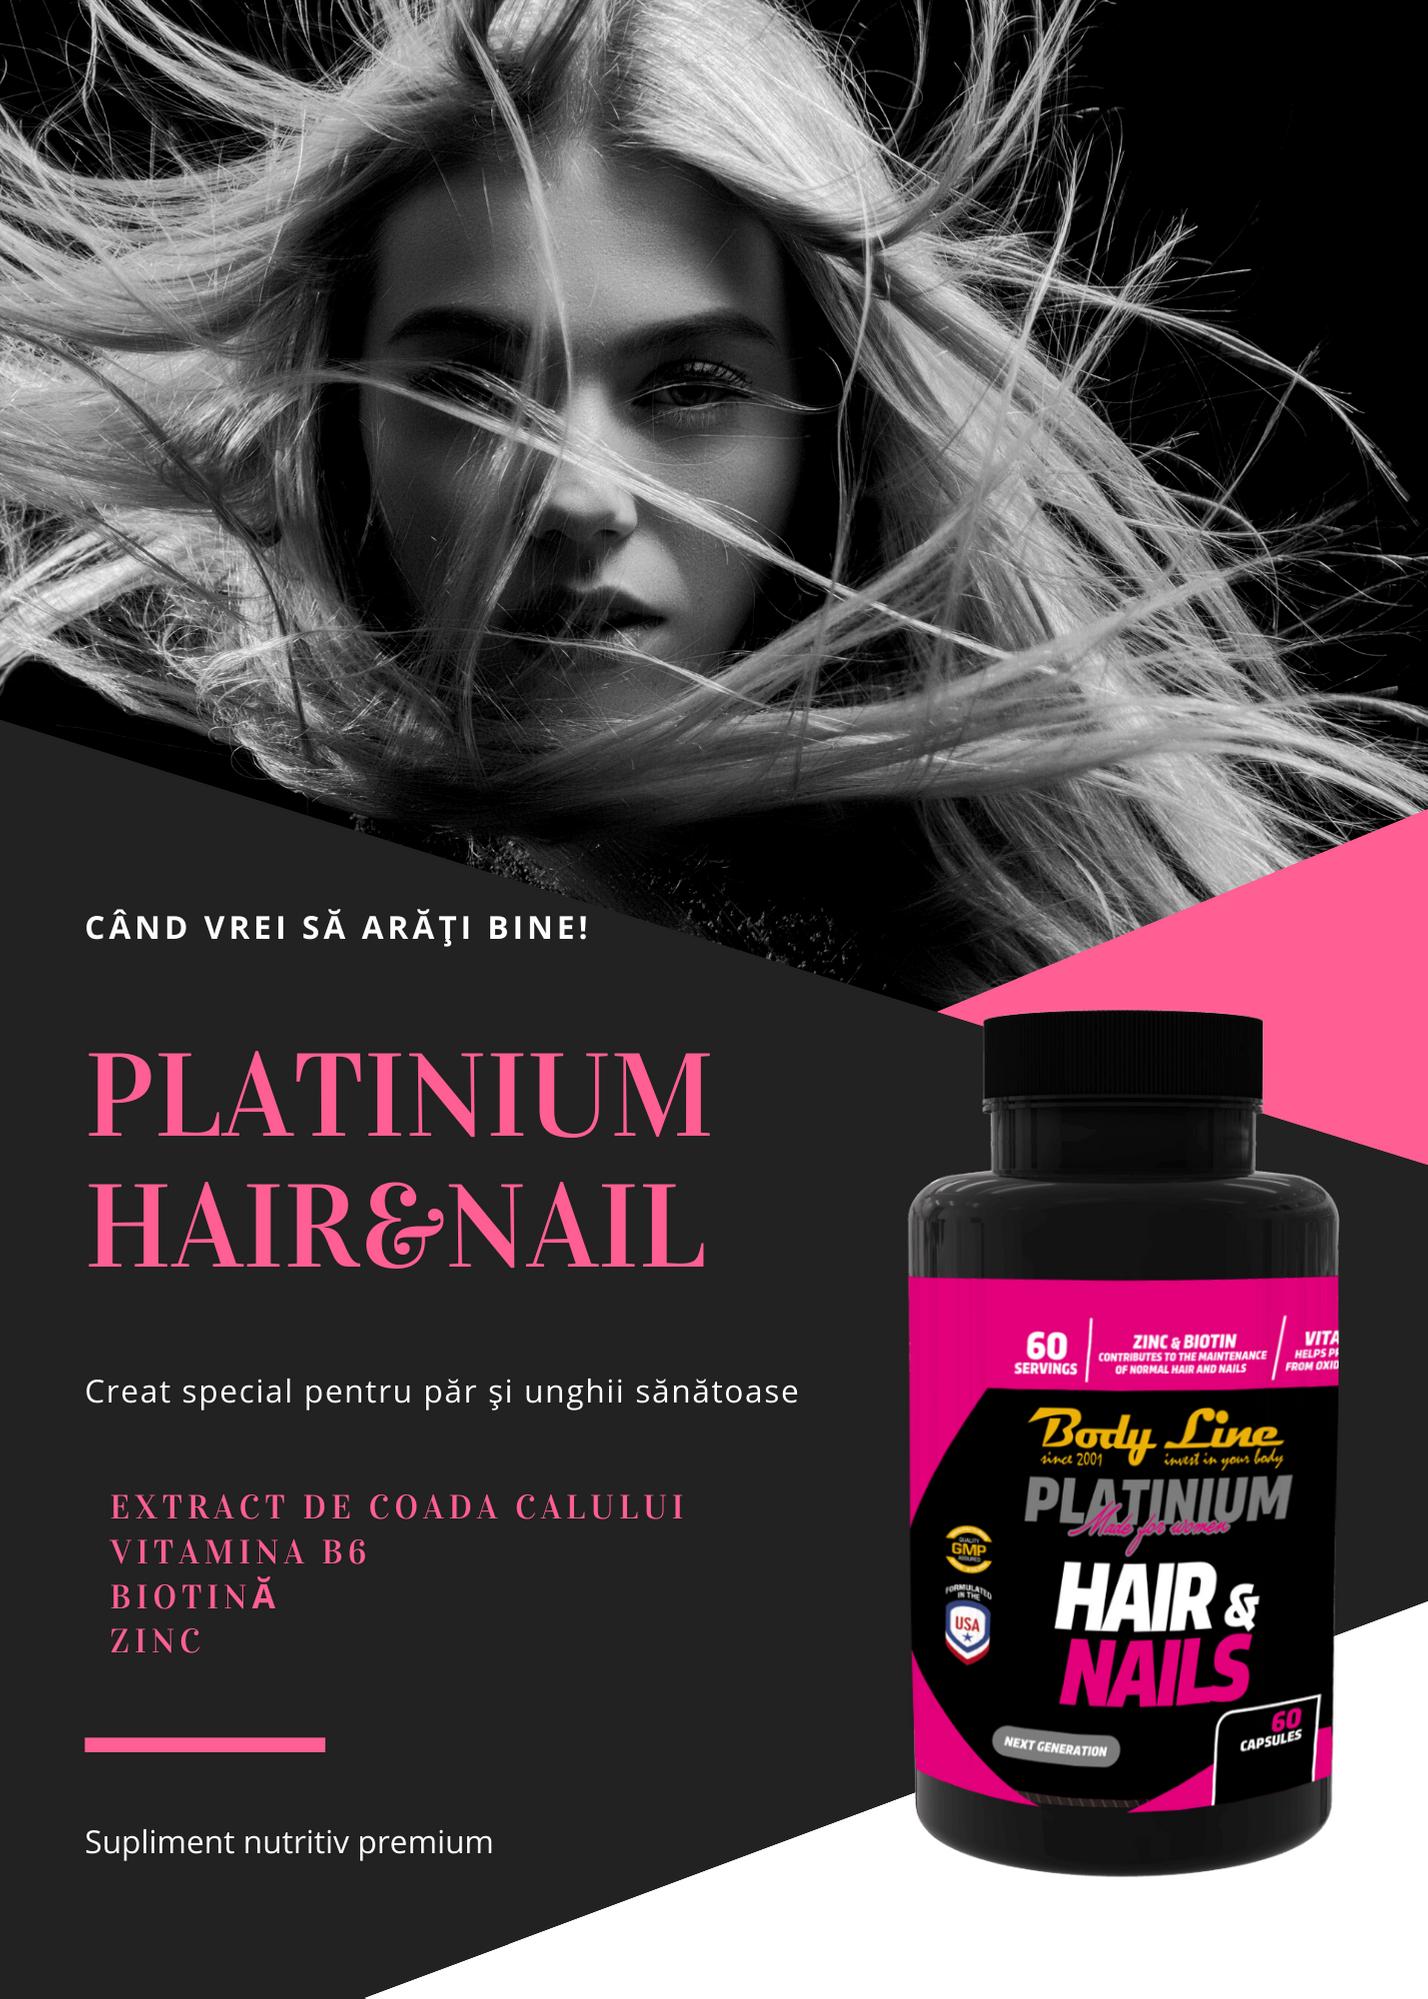 Platinium HAIRNAIL New Product